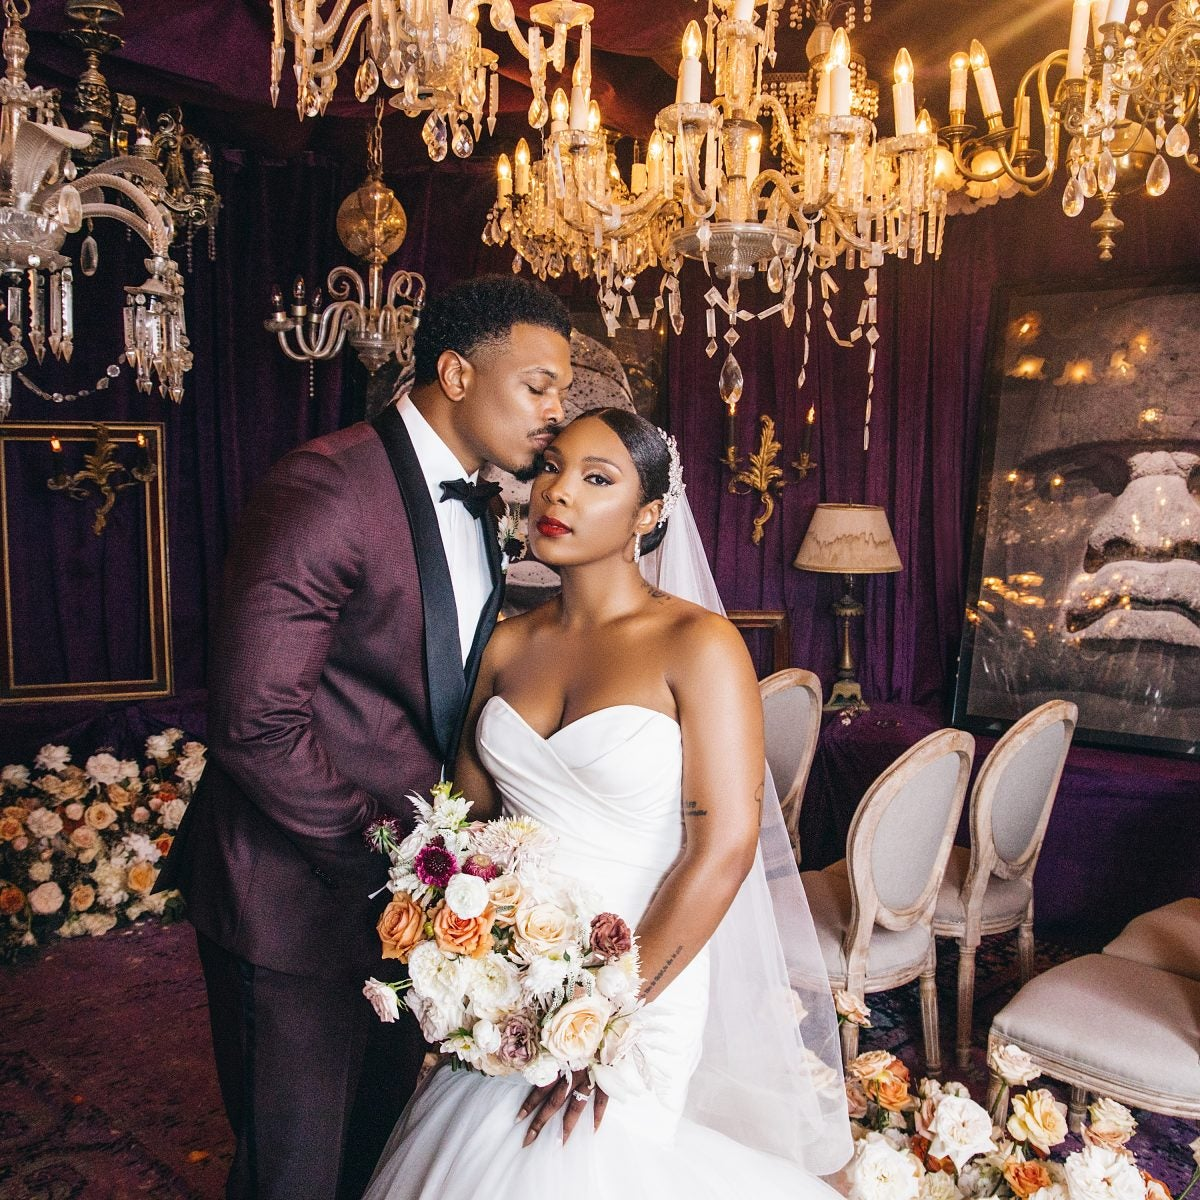 Bridal Bliss: Kady And Jason's Destination Wedding Left Us Speechless